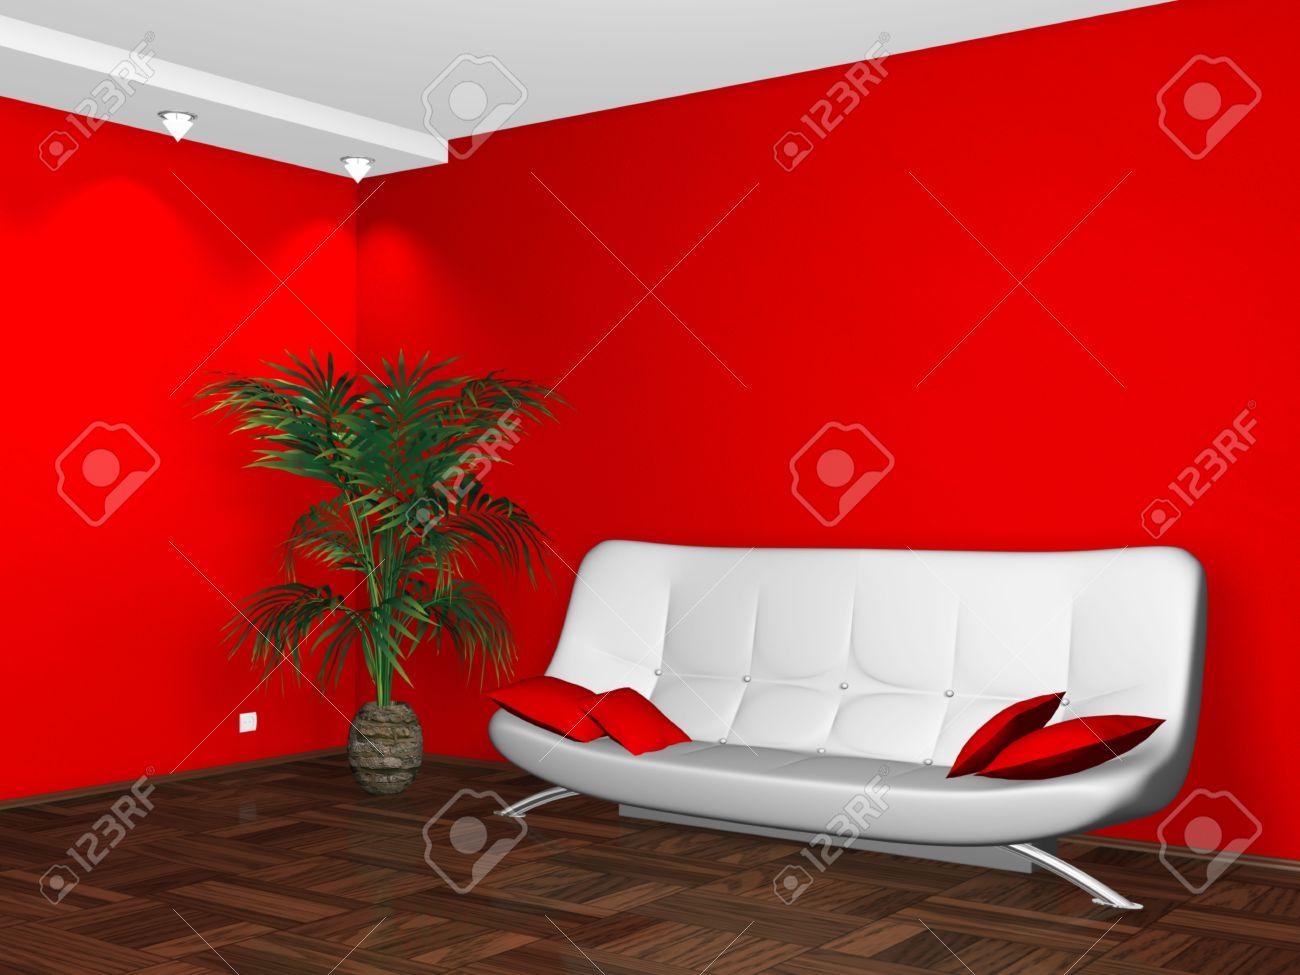 Interieur Design Moderne Witte Luie Stoel Op Rode Muur Achtergrond ...